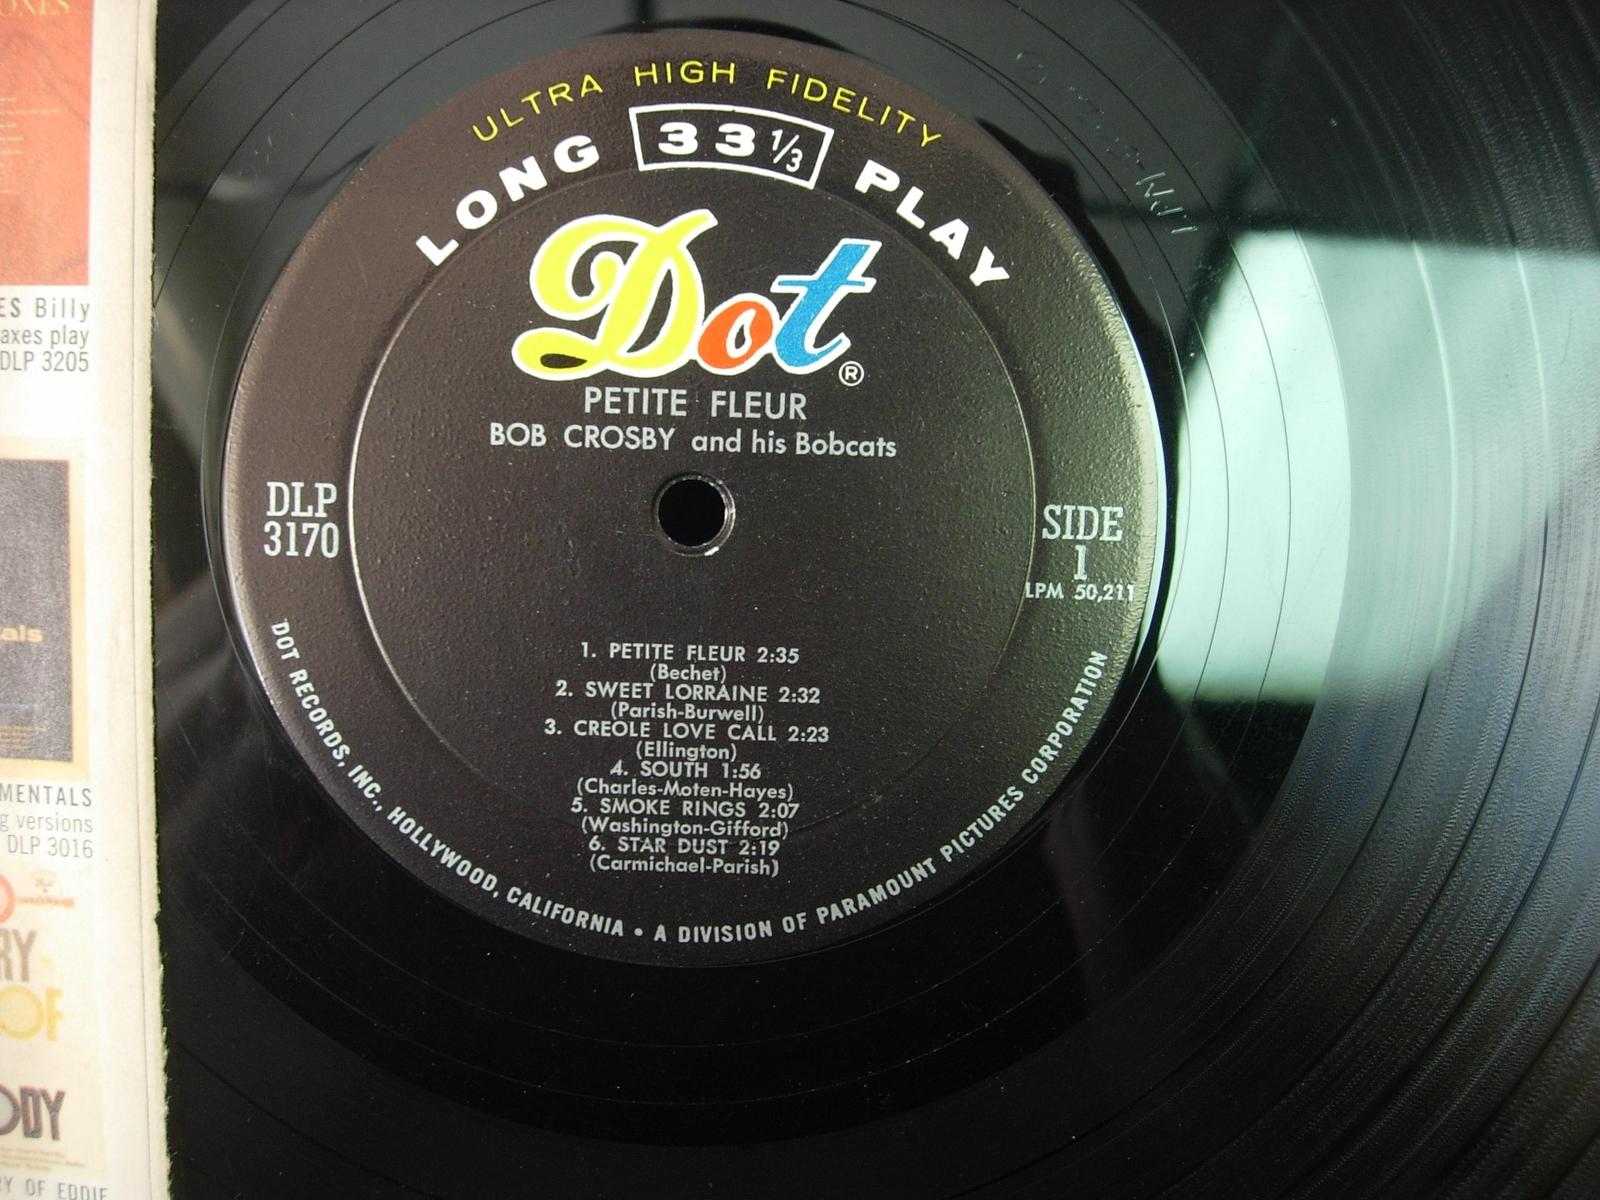 Bob Crosby & His Bobcats - Petite Fleur - Dot DLP 3170